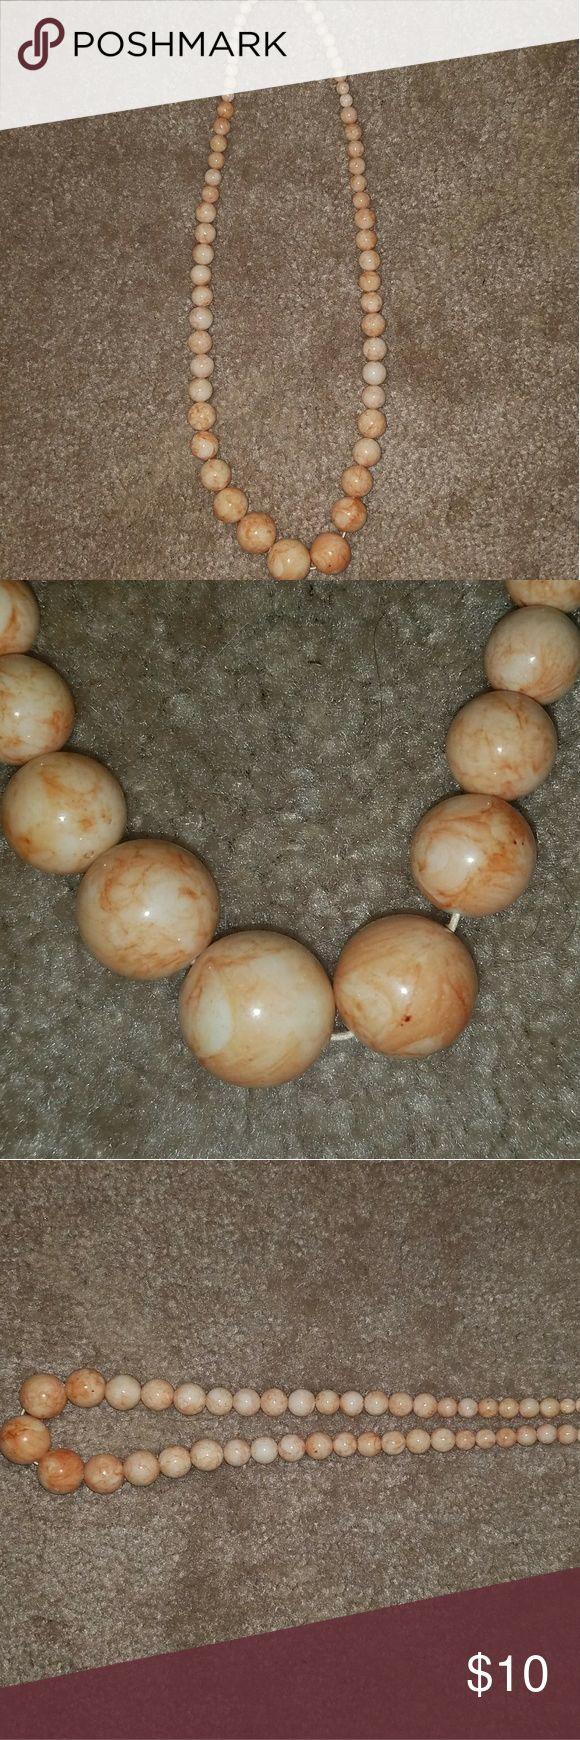 Super cute peach necklace EUC peach necklace Jewelry Necklaces